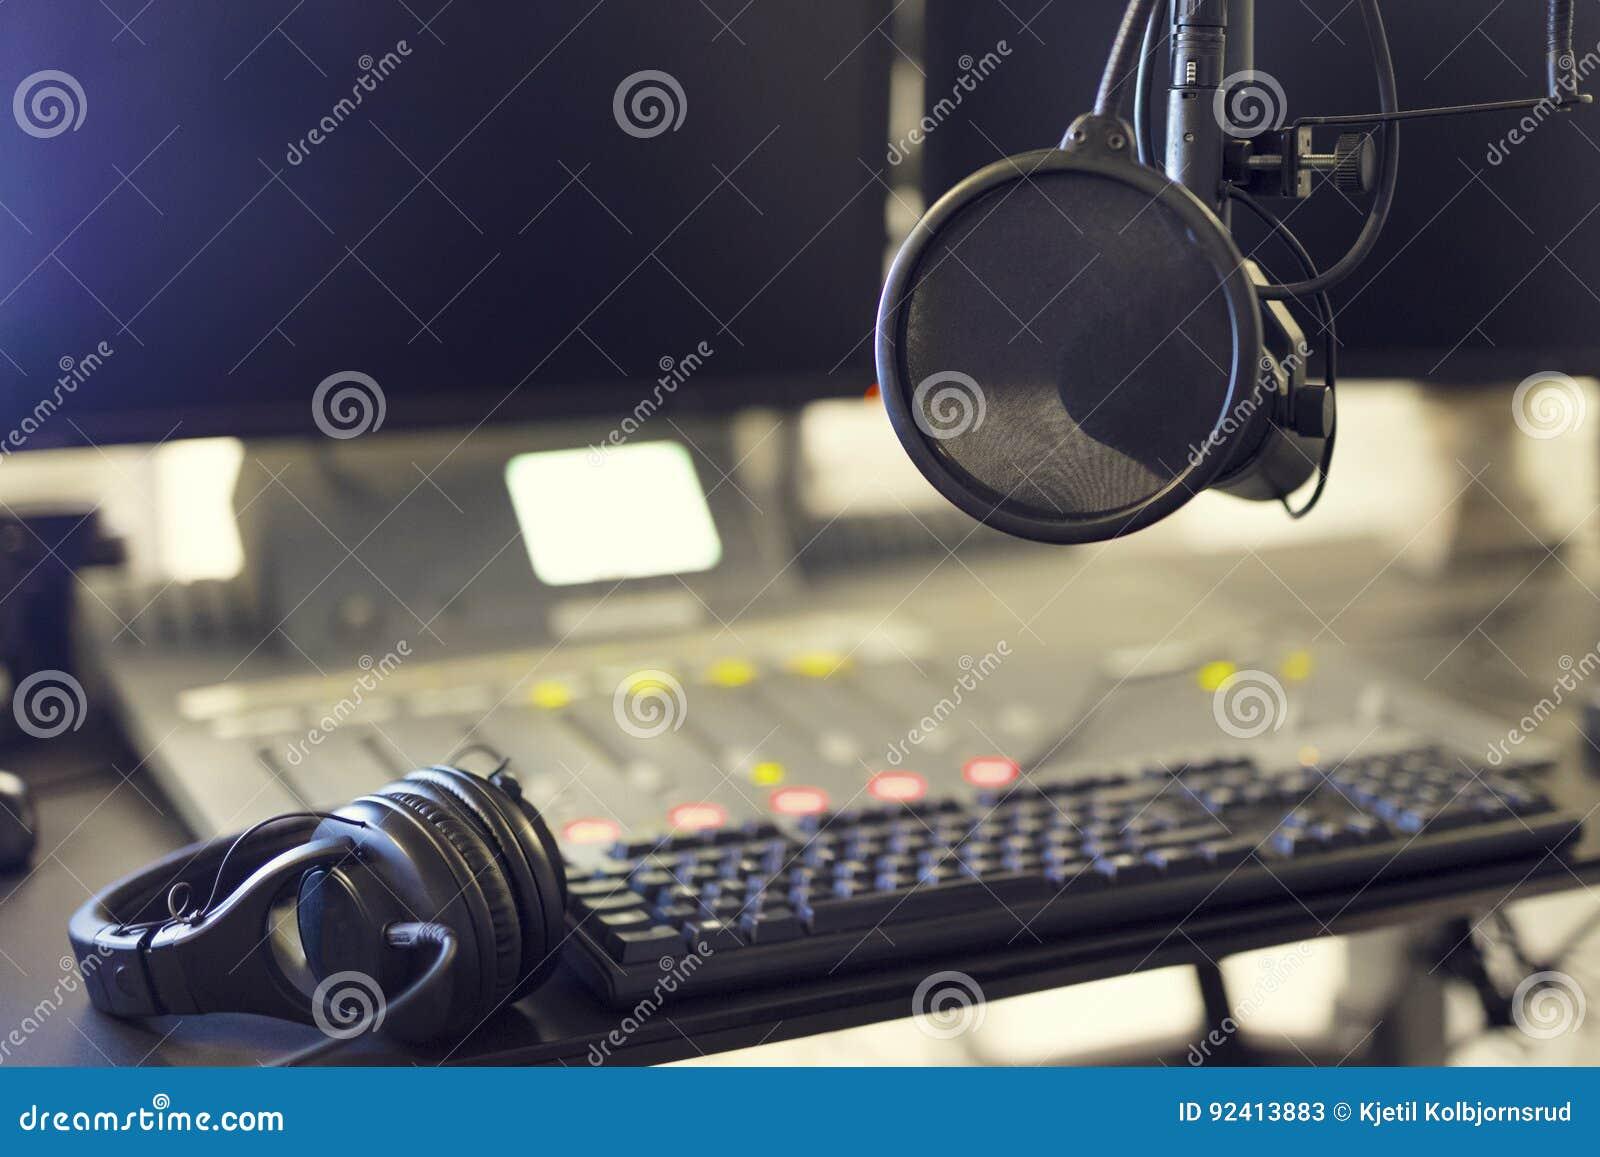 Microphone et casque dans le studio de radiodiffusion de station de radio